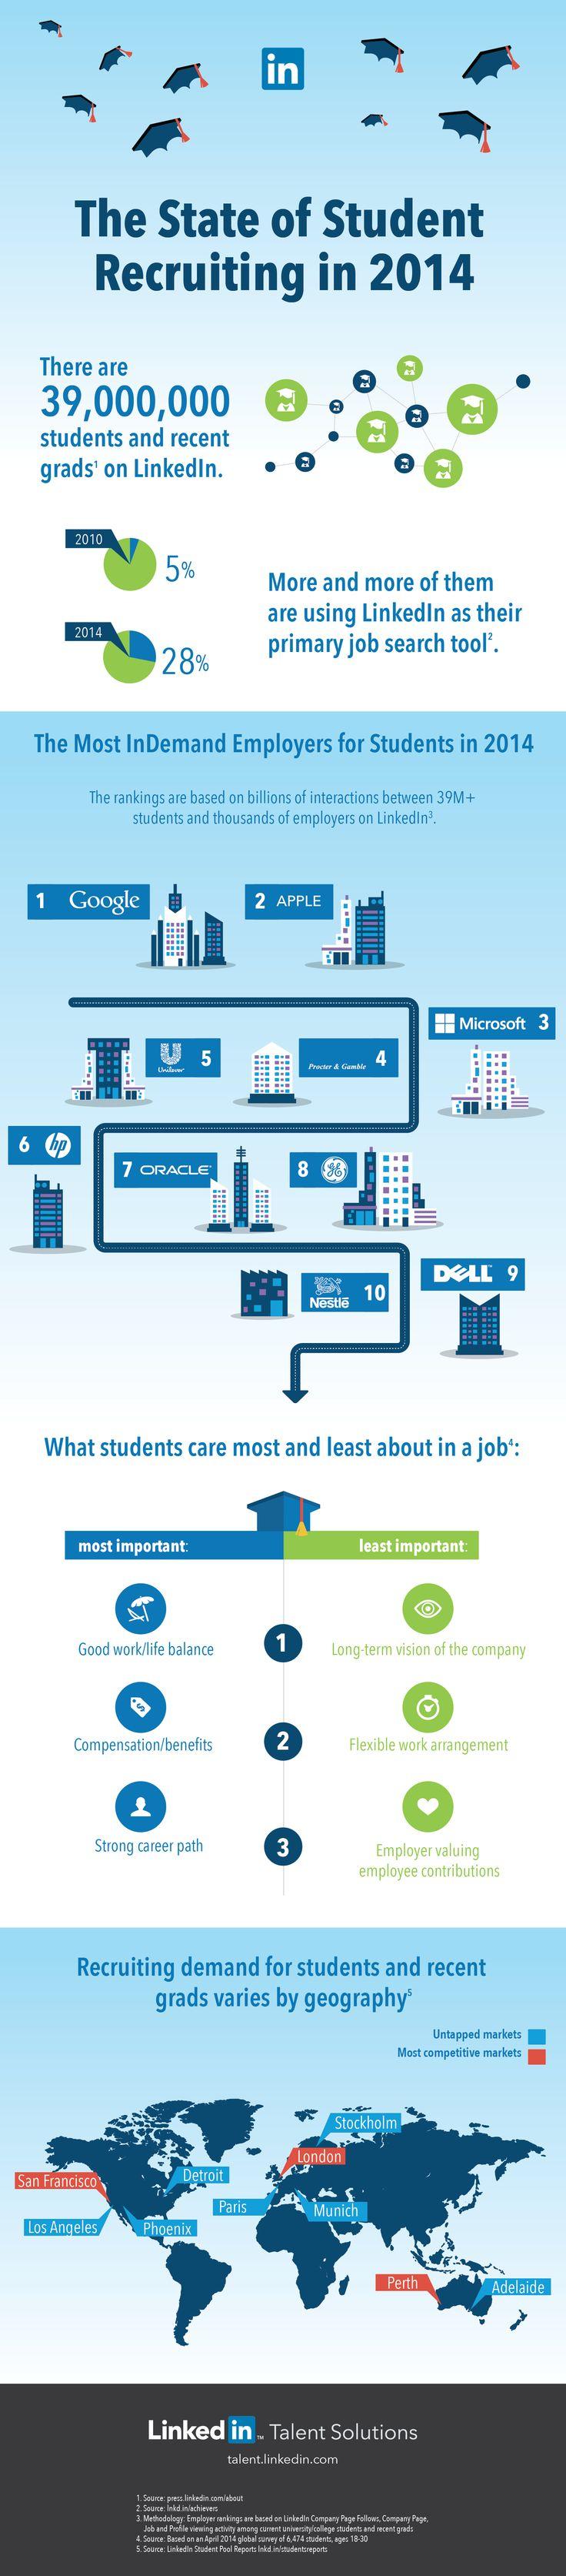 Corporates recruiting college graduates social and